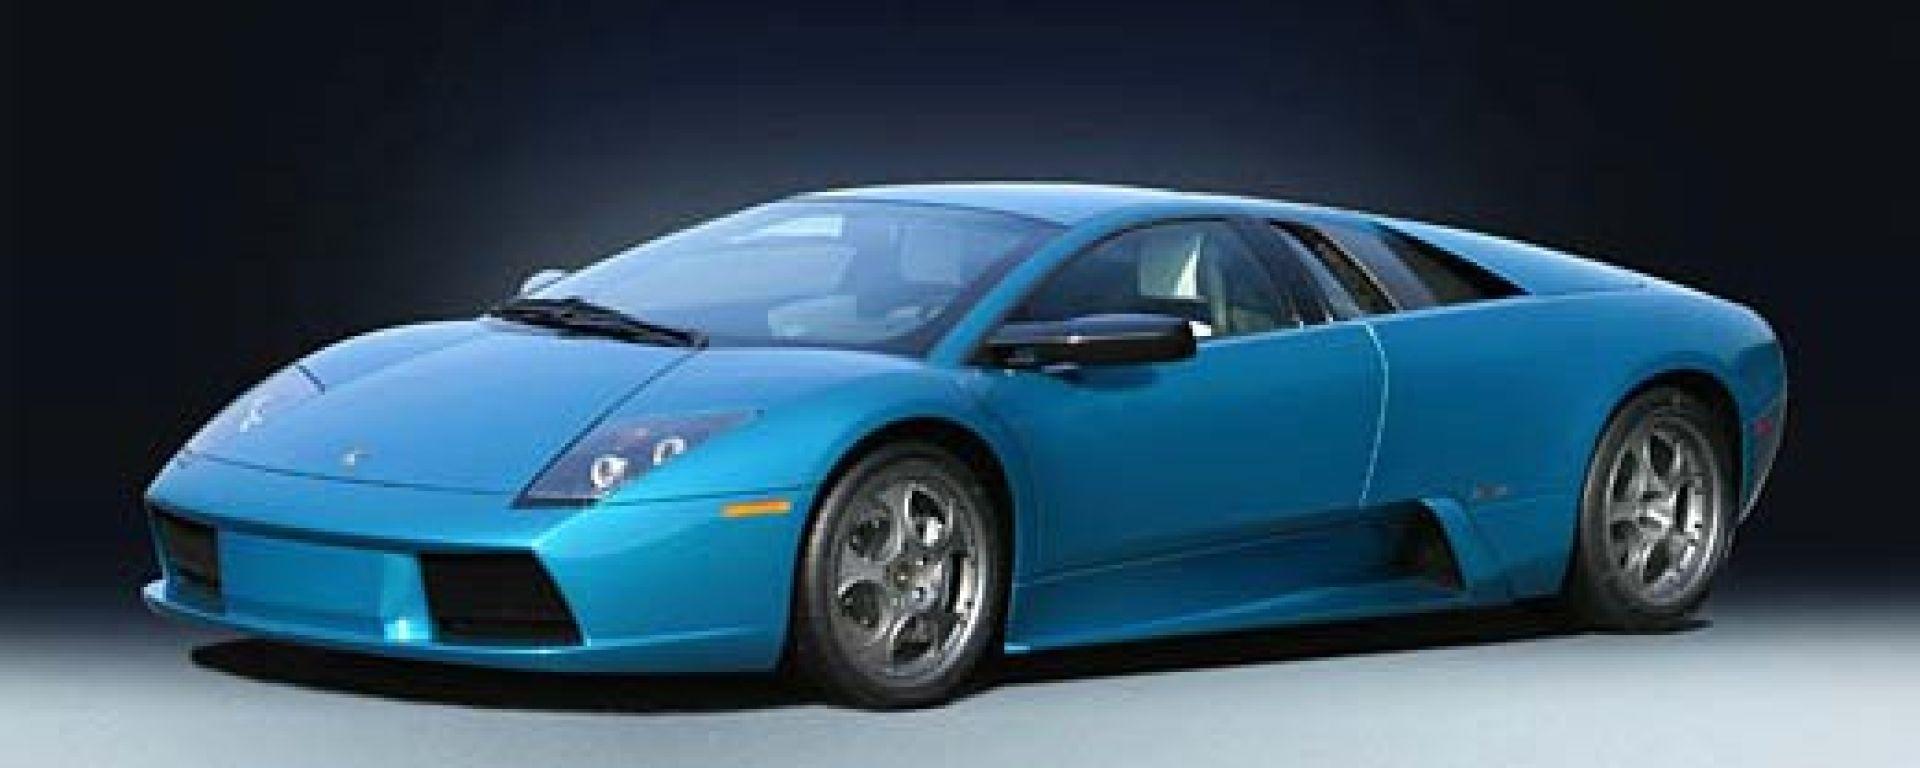 Lamborghini Murciélago 40mo Anniversario